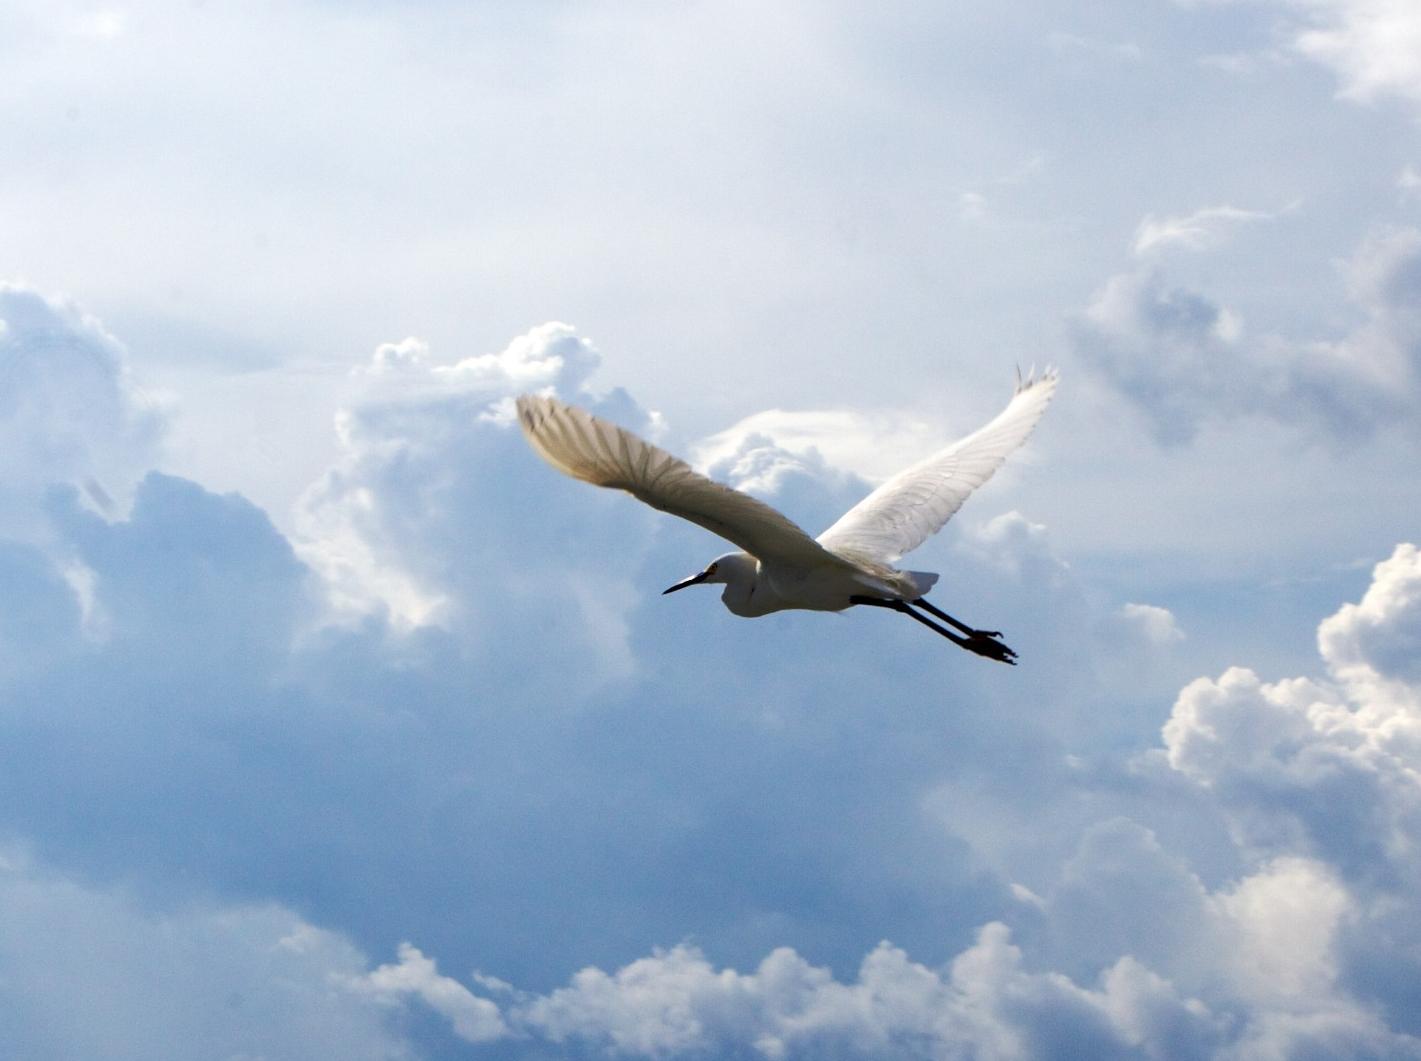 A bird soars over the gulf